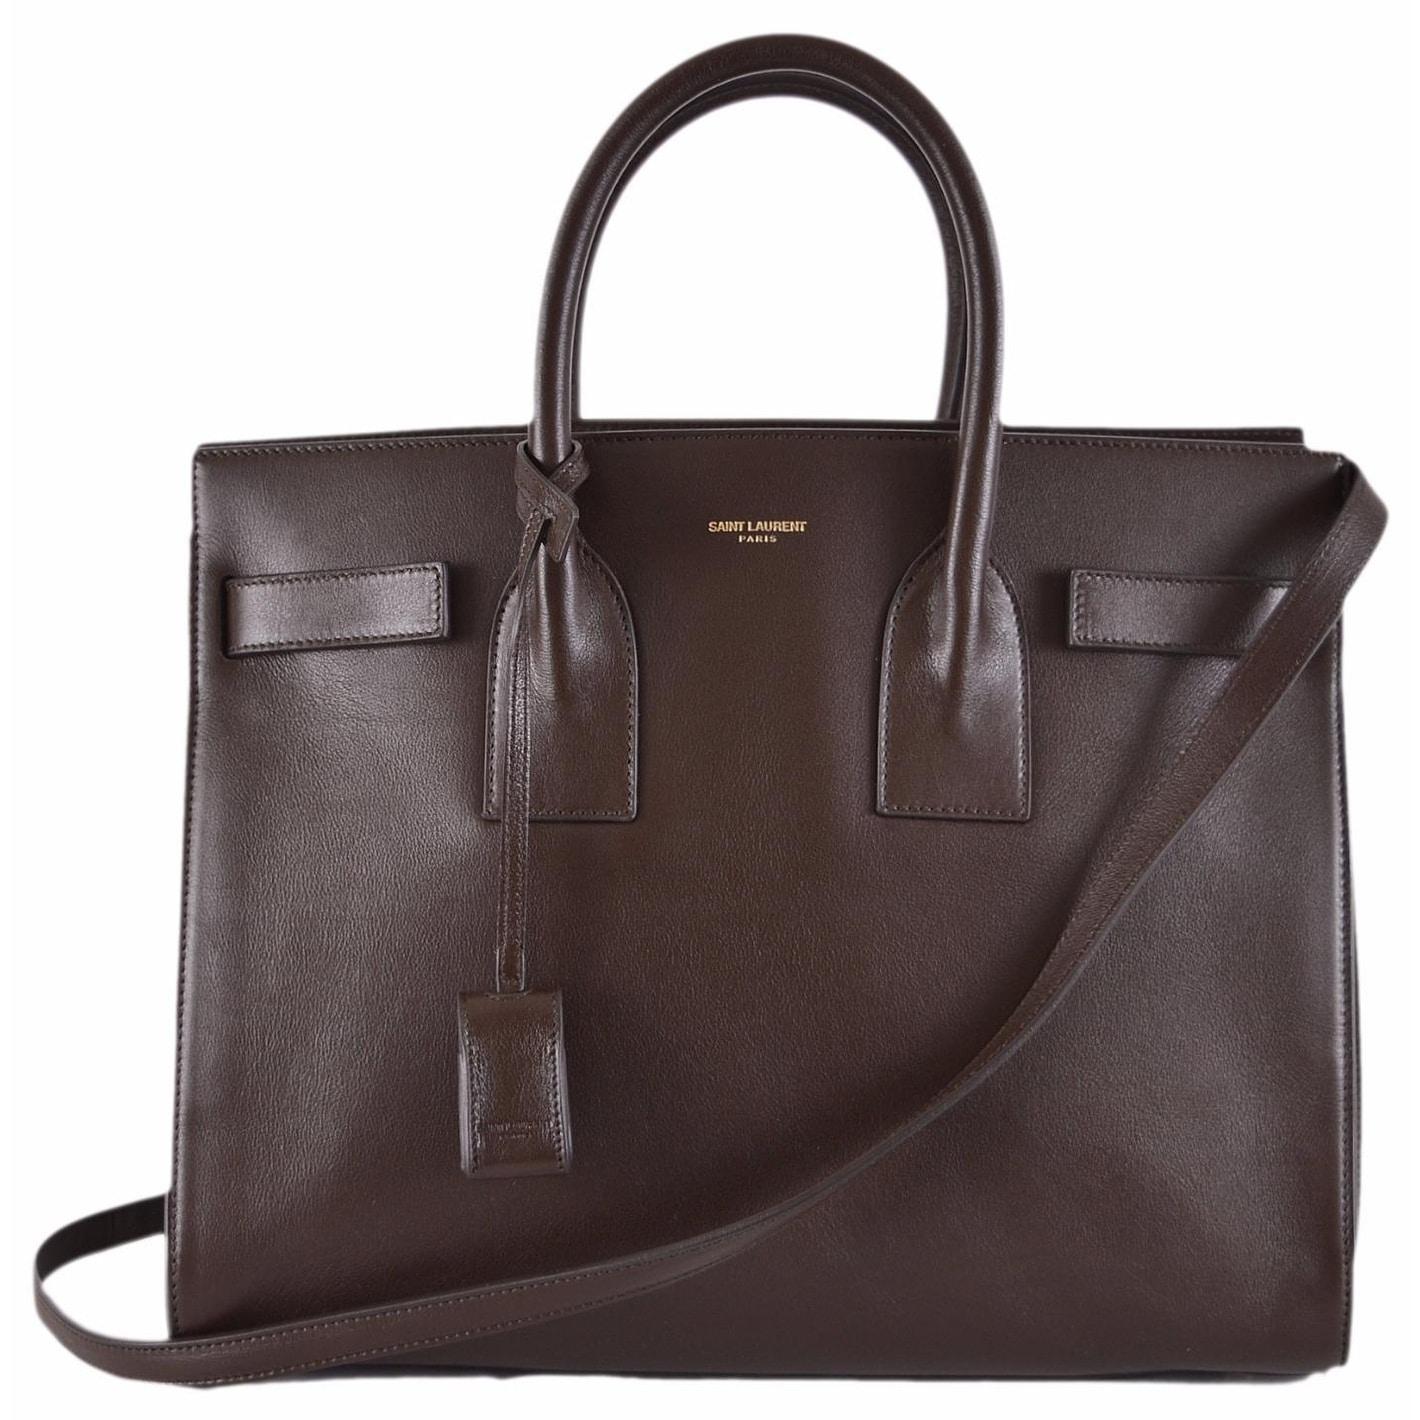 ee992185abf6 Yves Saint Laurent YSL Brown Leather Sac de Jour Small Handbag Purse  W Strap -